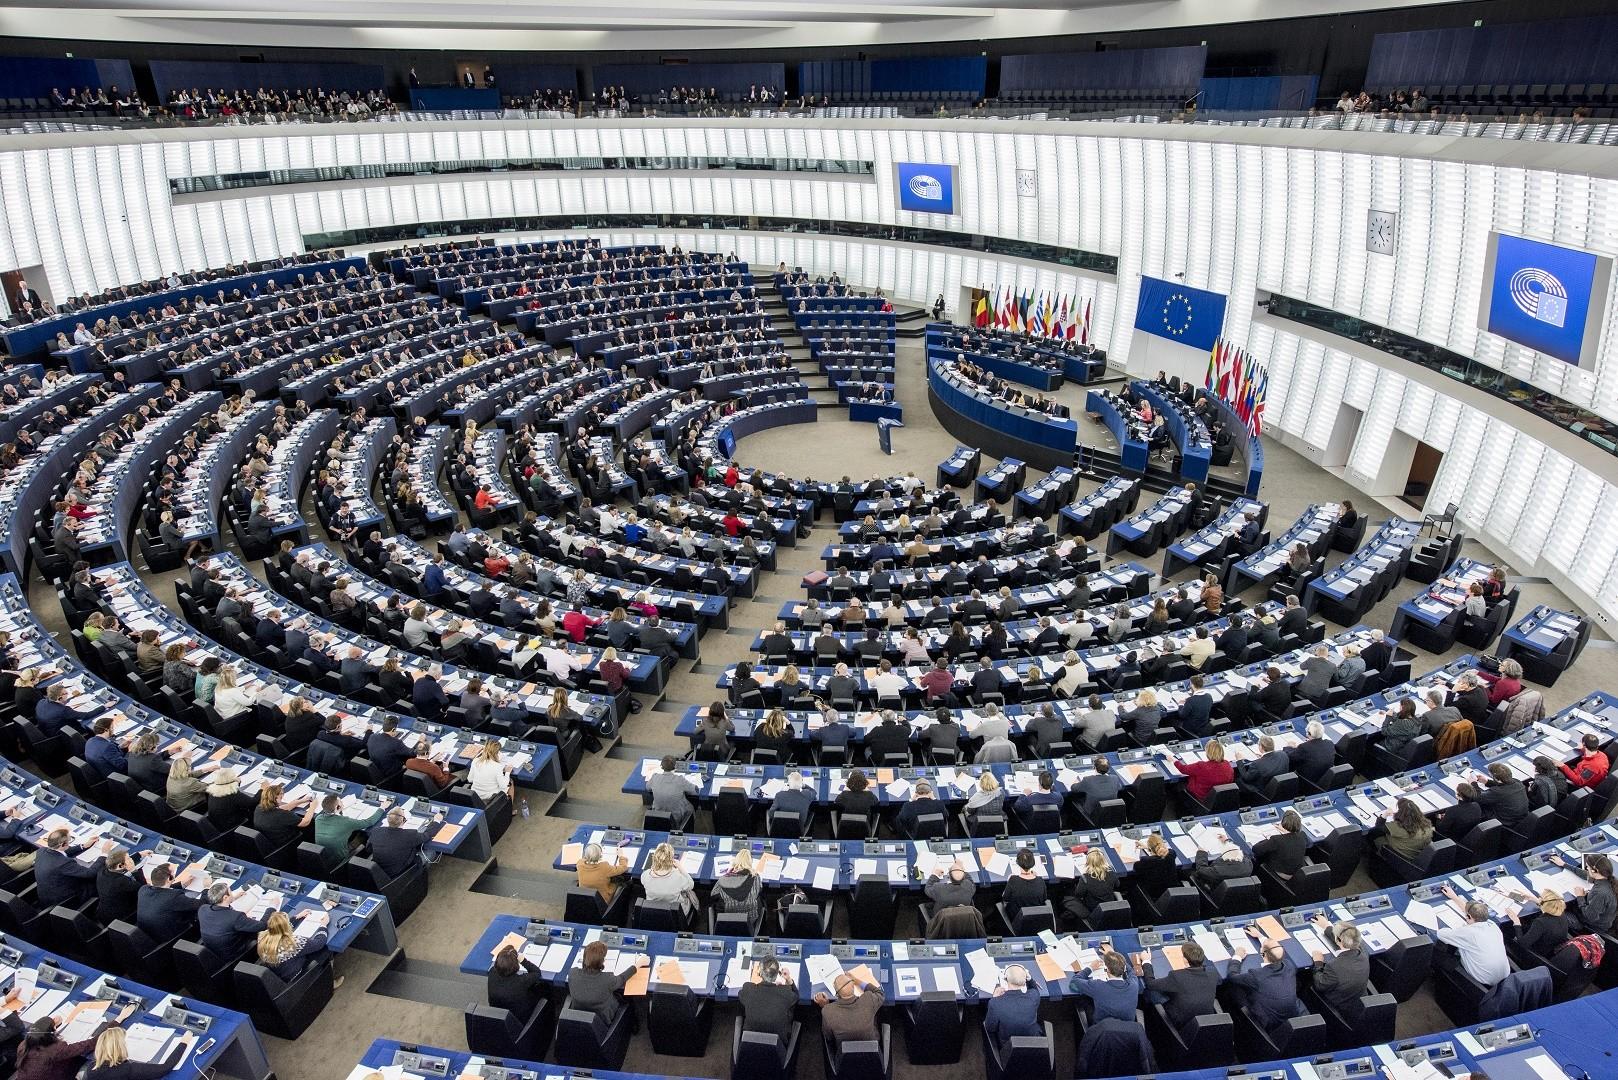 Lettera all'Europa e agli Europei